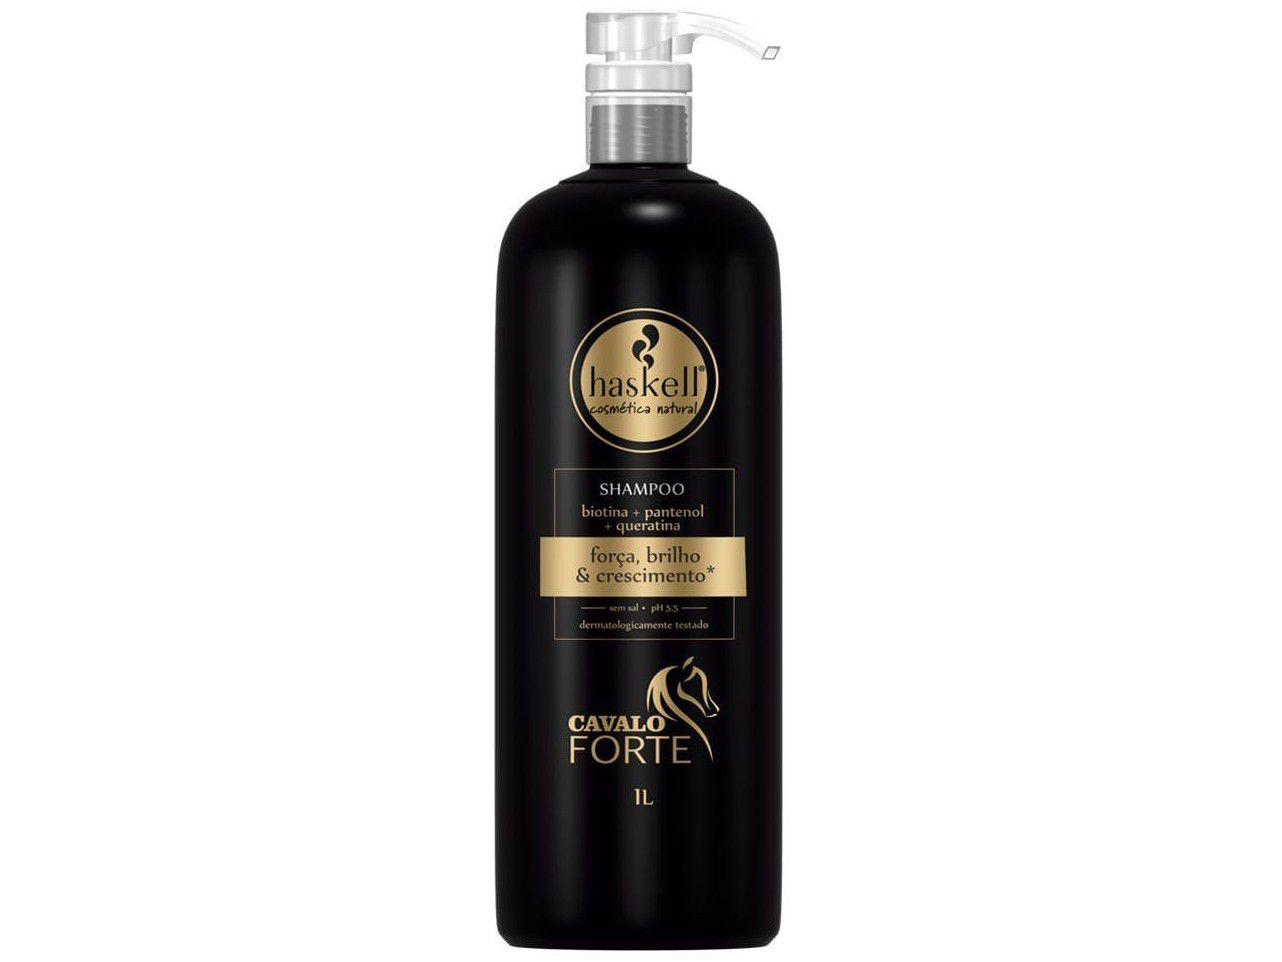 Haskell Cavalo Forte - Shampoo